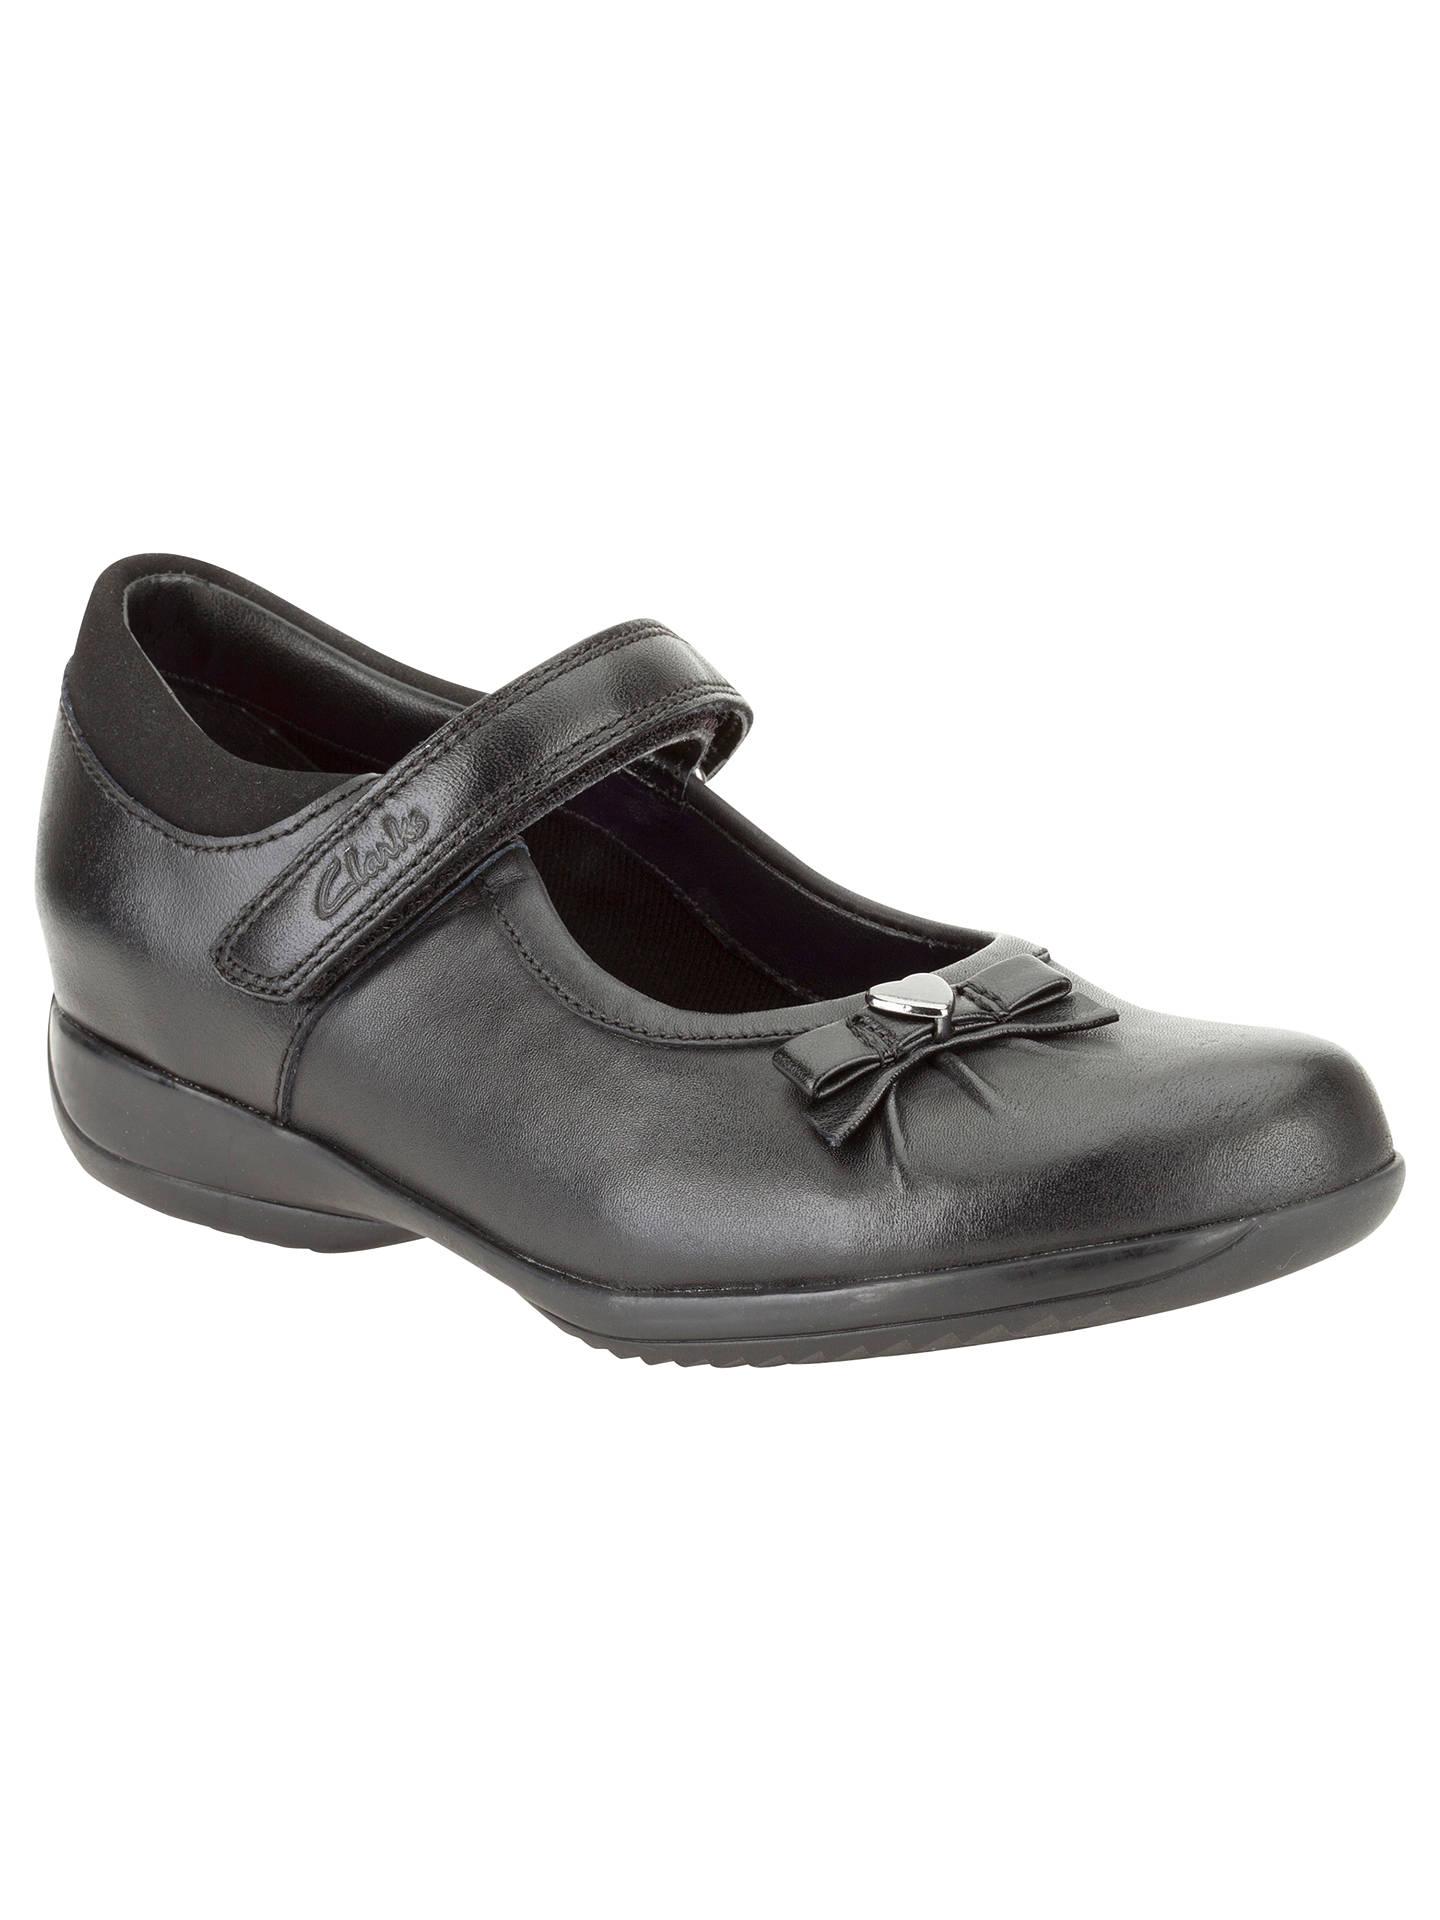 71683fd5de3e9 Buy Clarks Daisy Gleam Leather Mary Jane Shoes, Black, 10E Jnr Online at  johnlewis ...